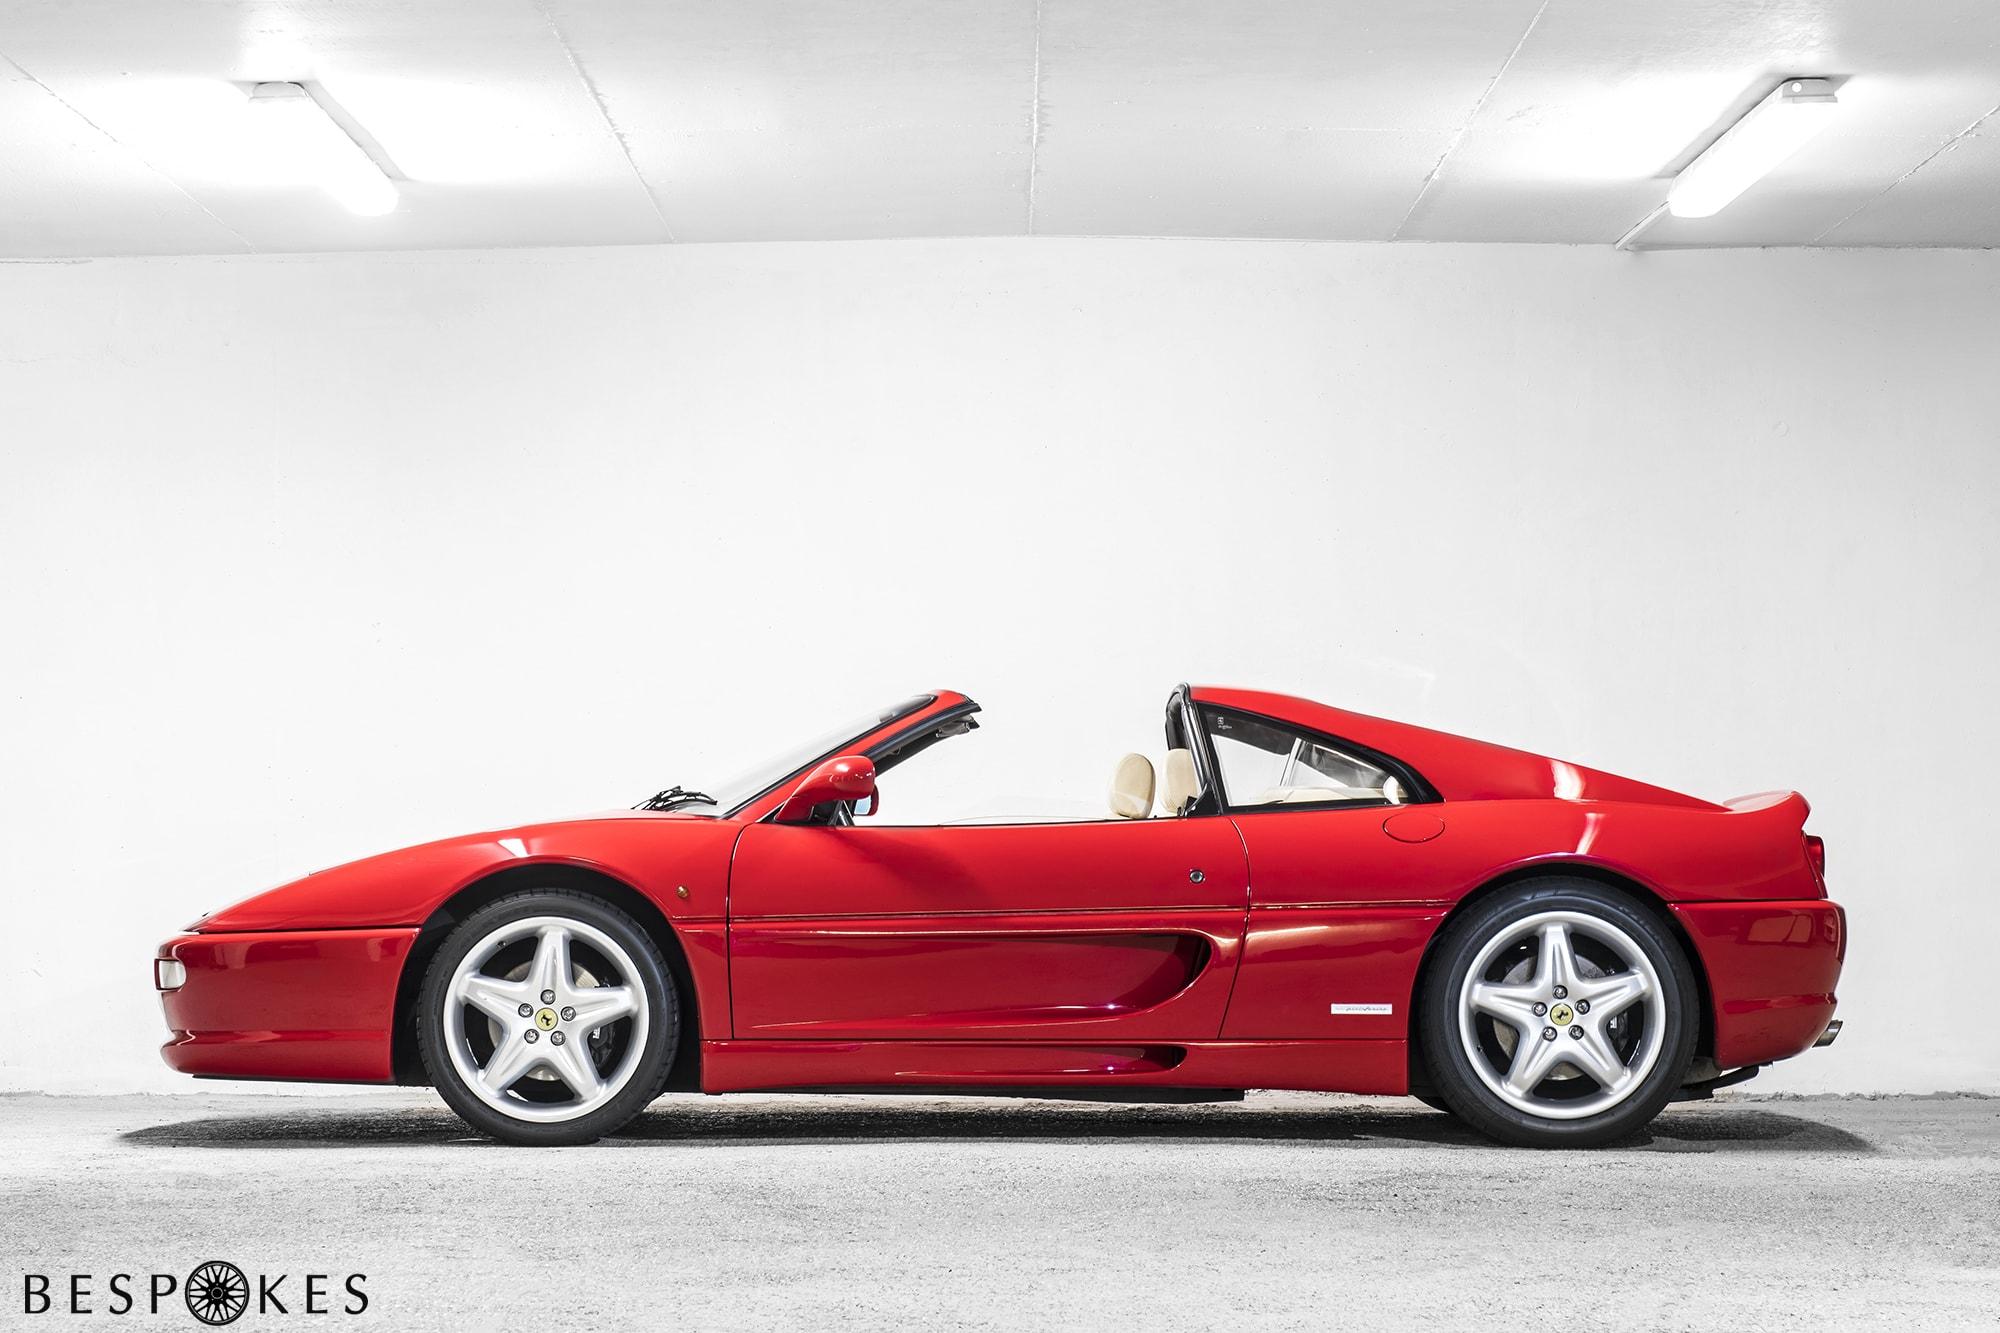 Ferrari 355 Gts Bespokes